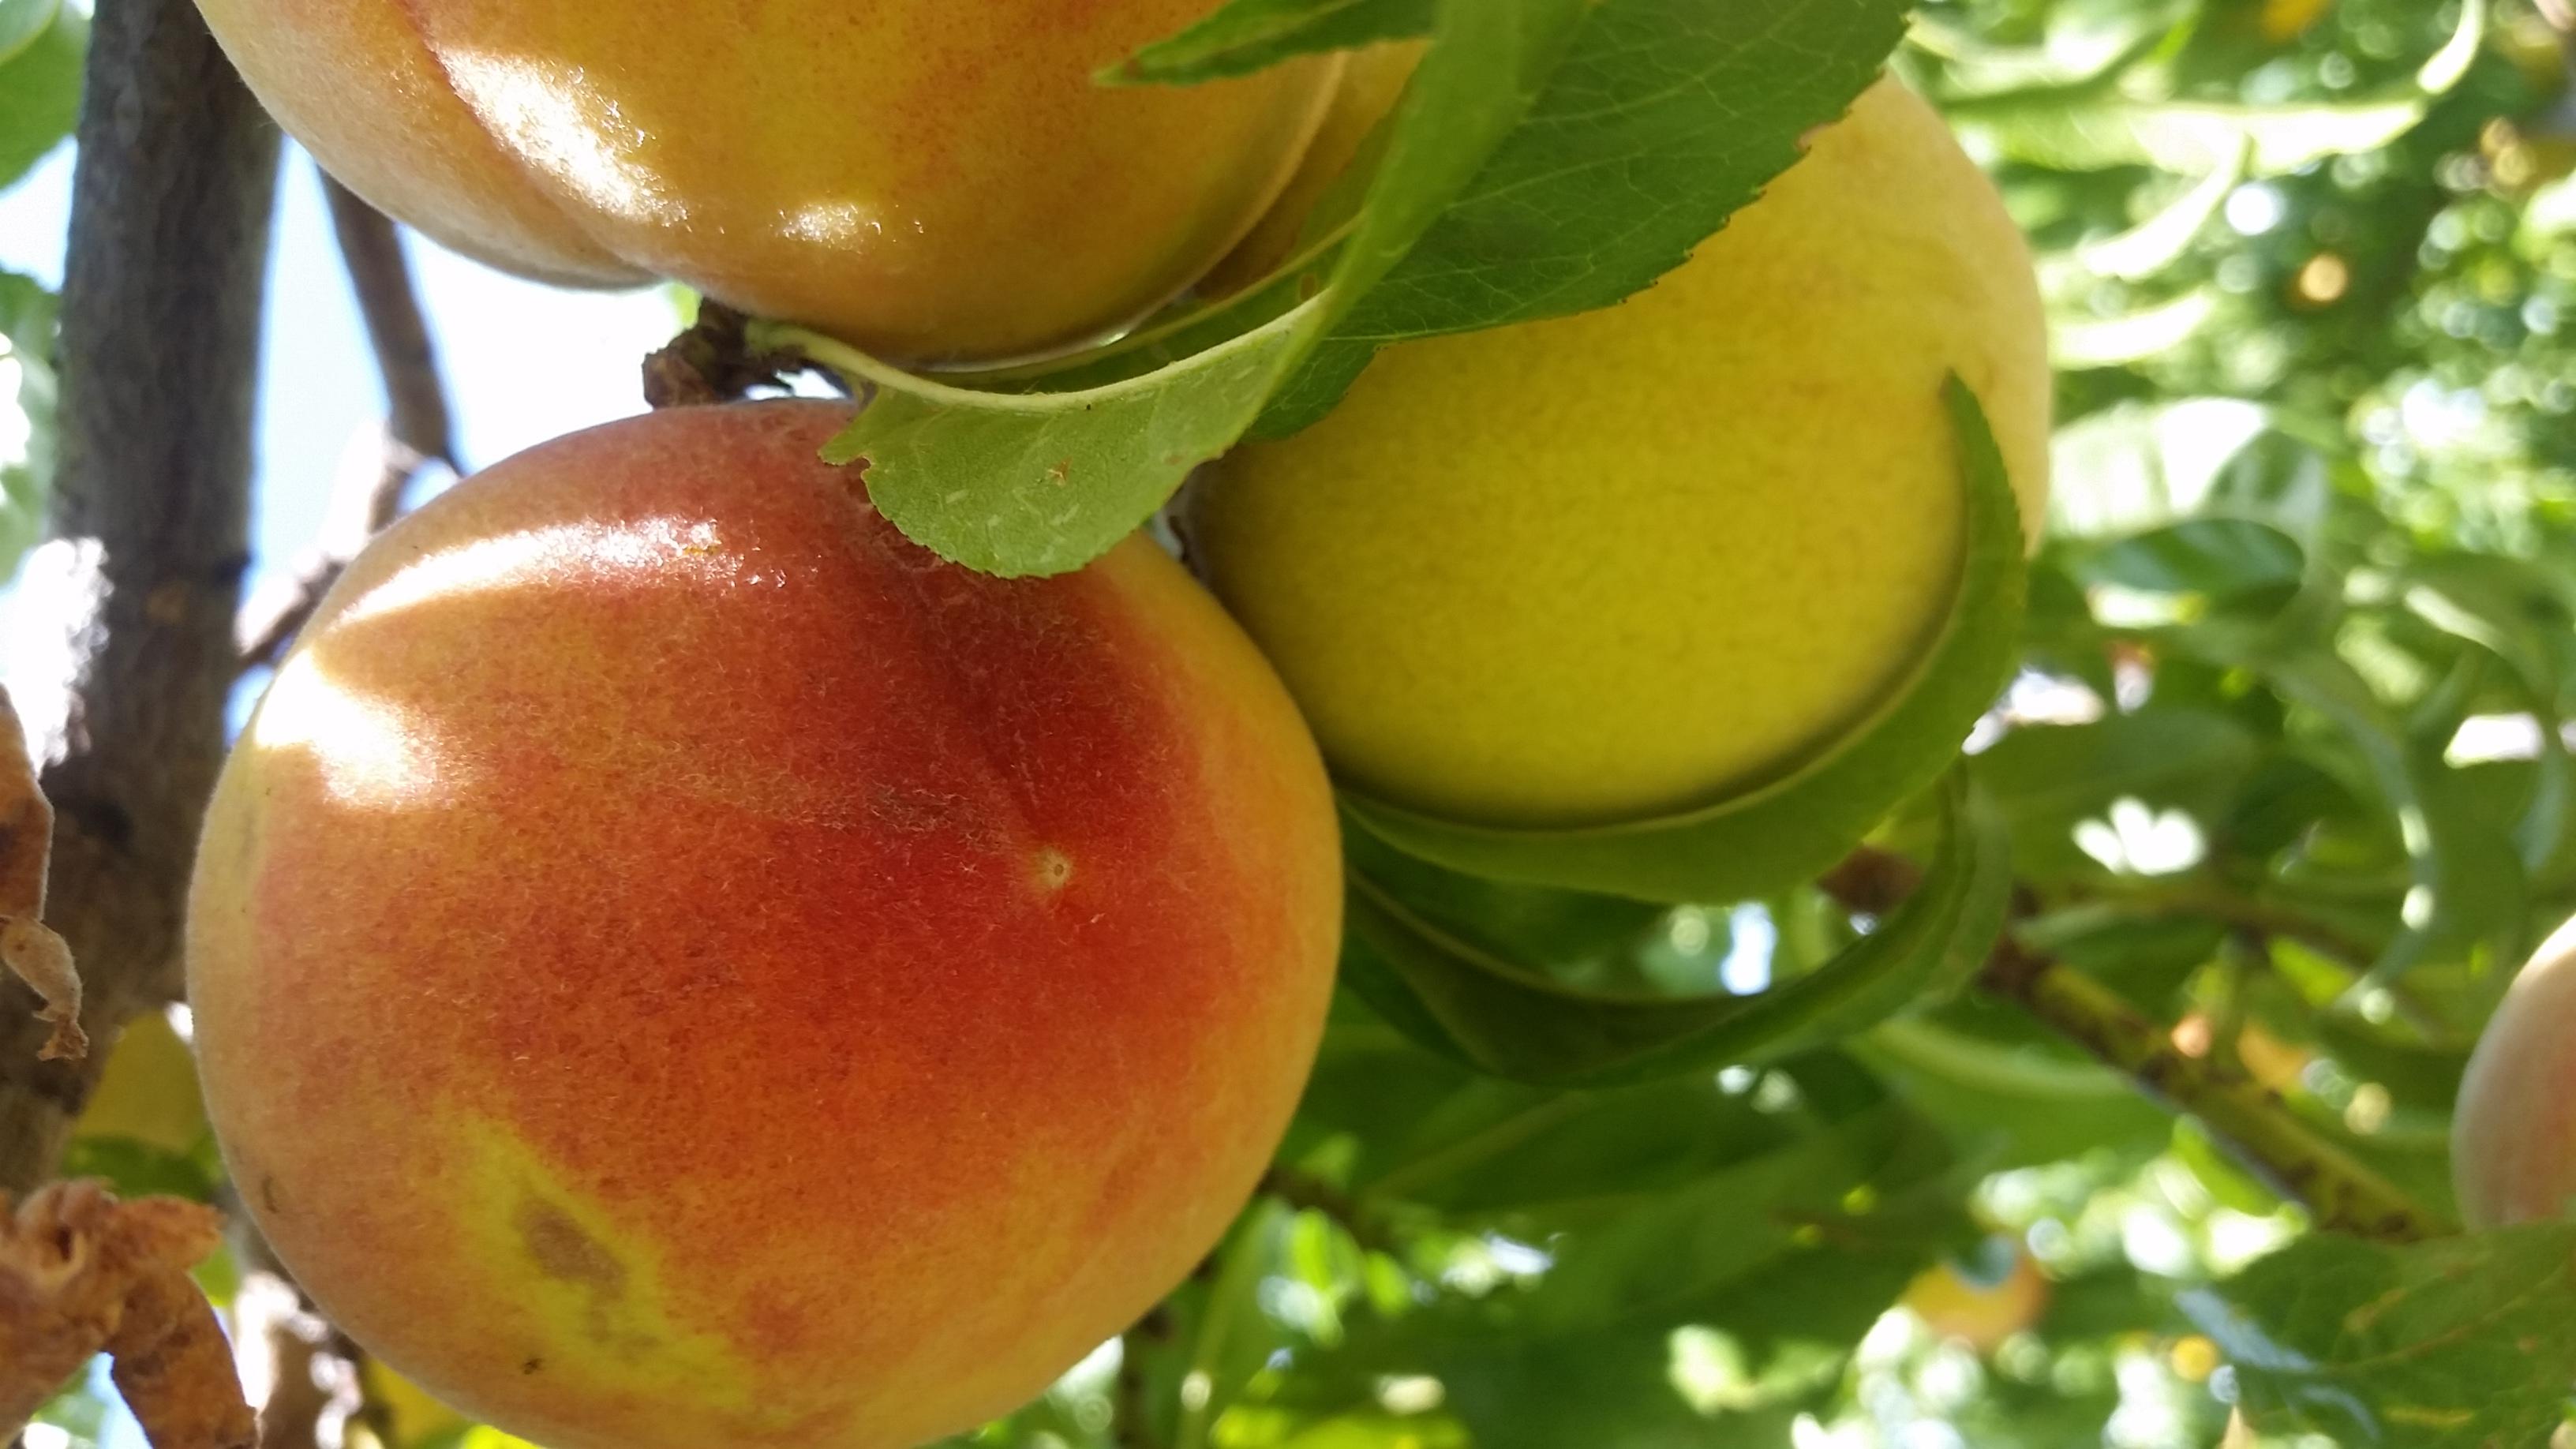 Peach harvest 2017